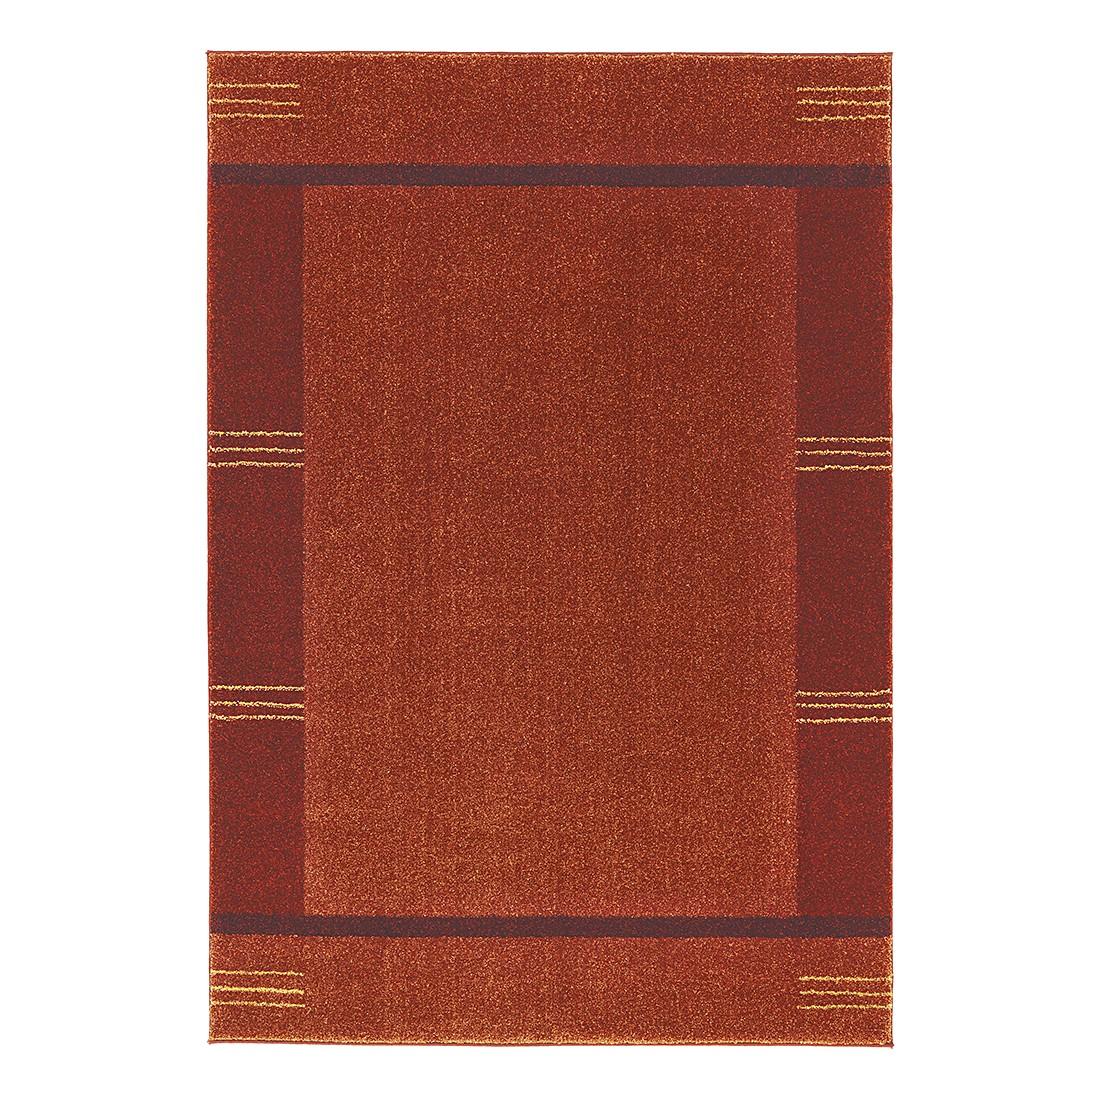 Teppich Samoa III – Rot – 80 x 150 cm, Astra online kaufen